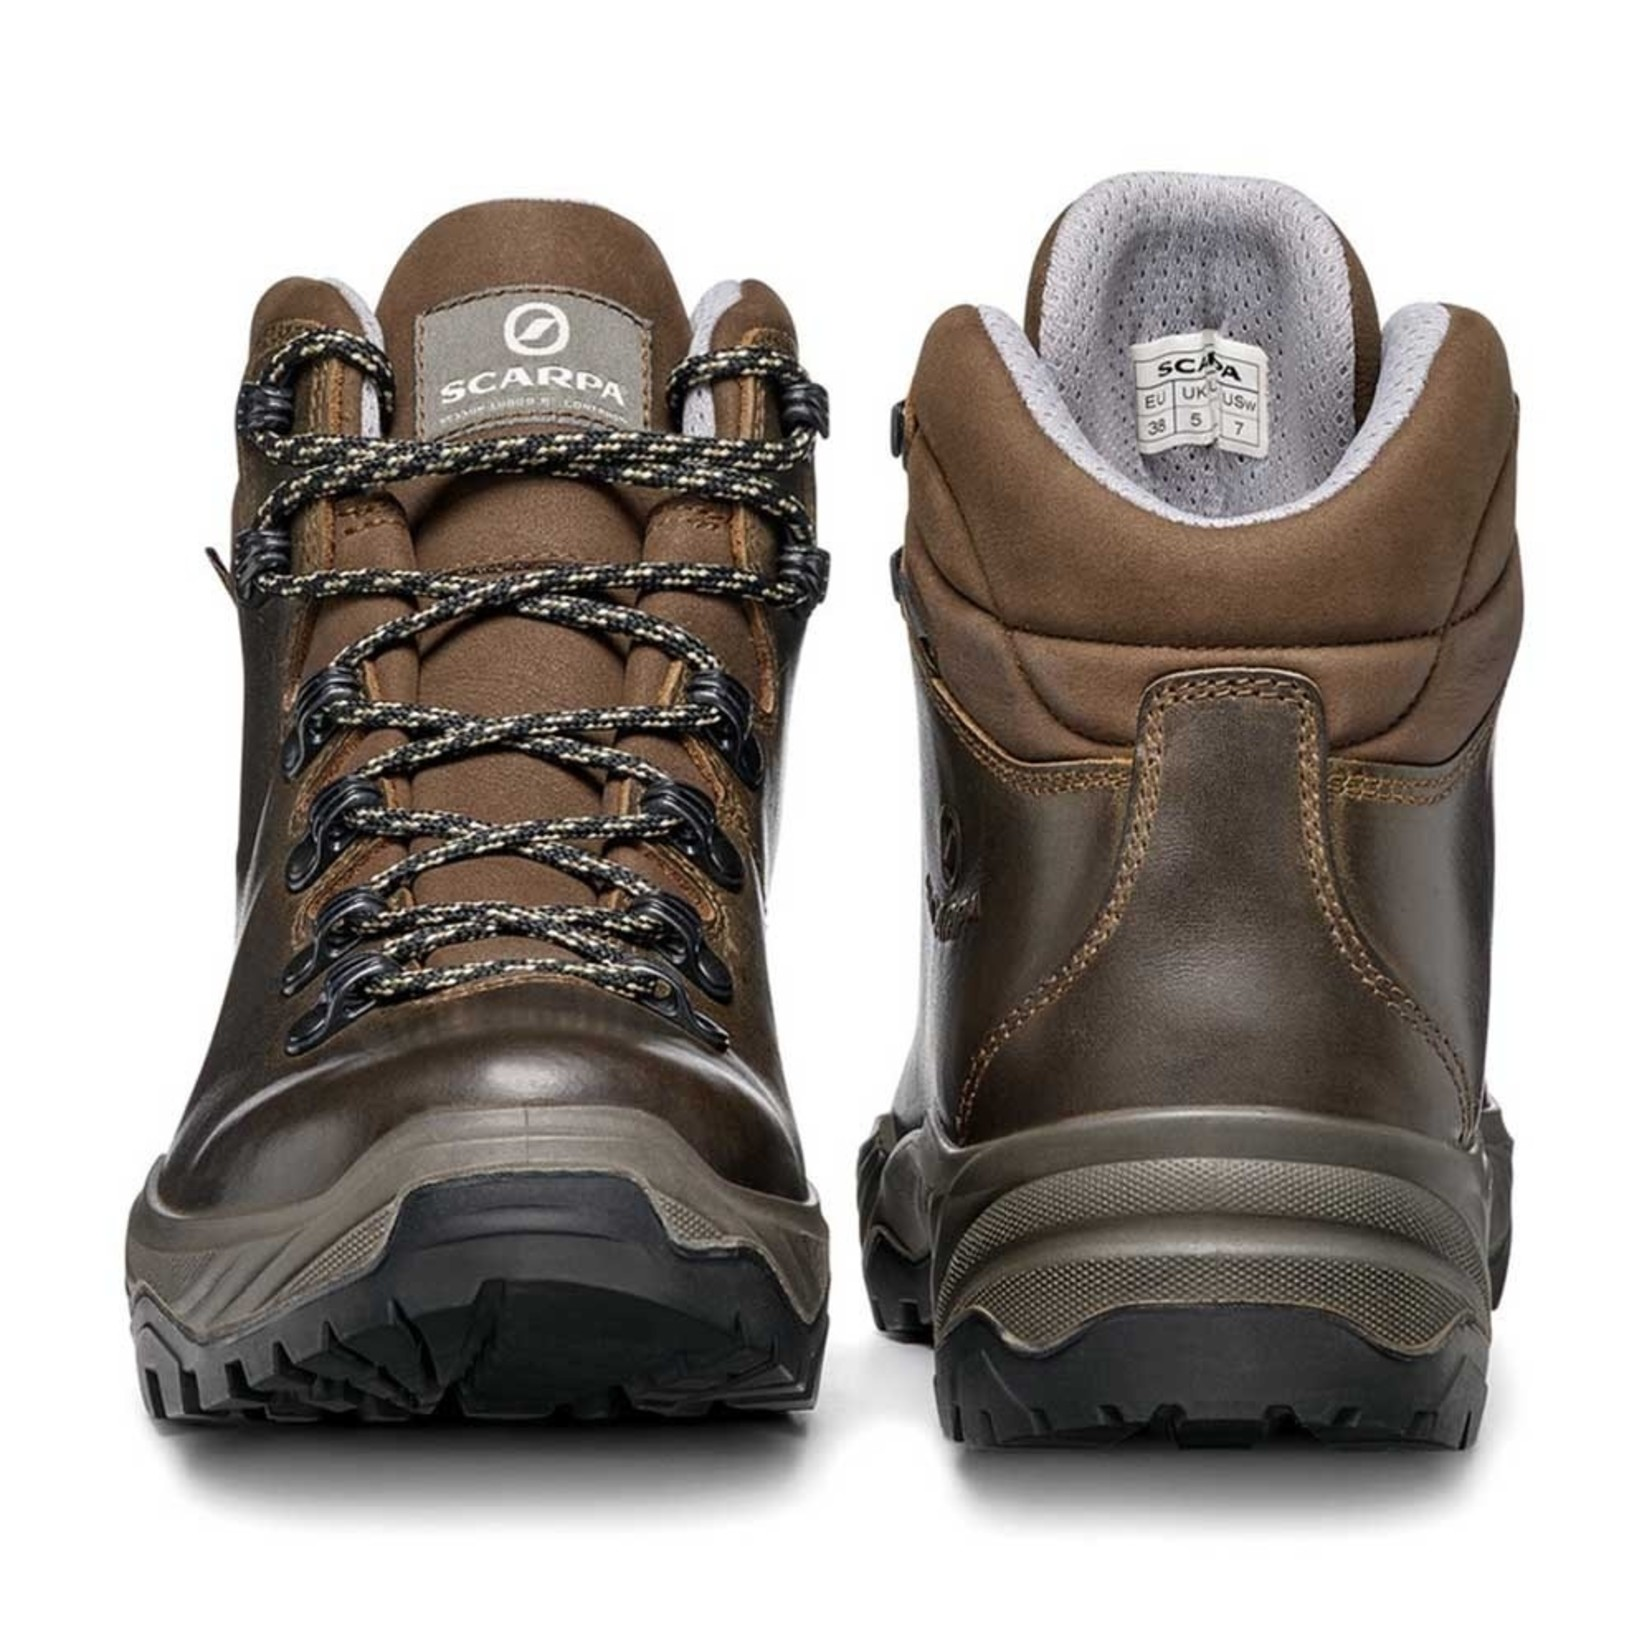 Scarpa Bottes de randonnée Scarpa Terra GTX - Femme